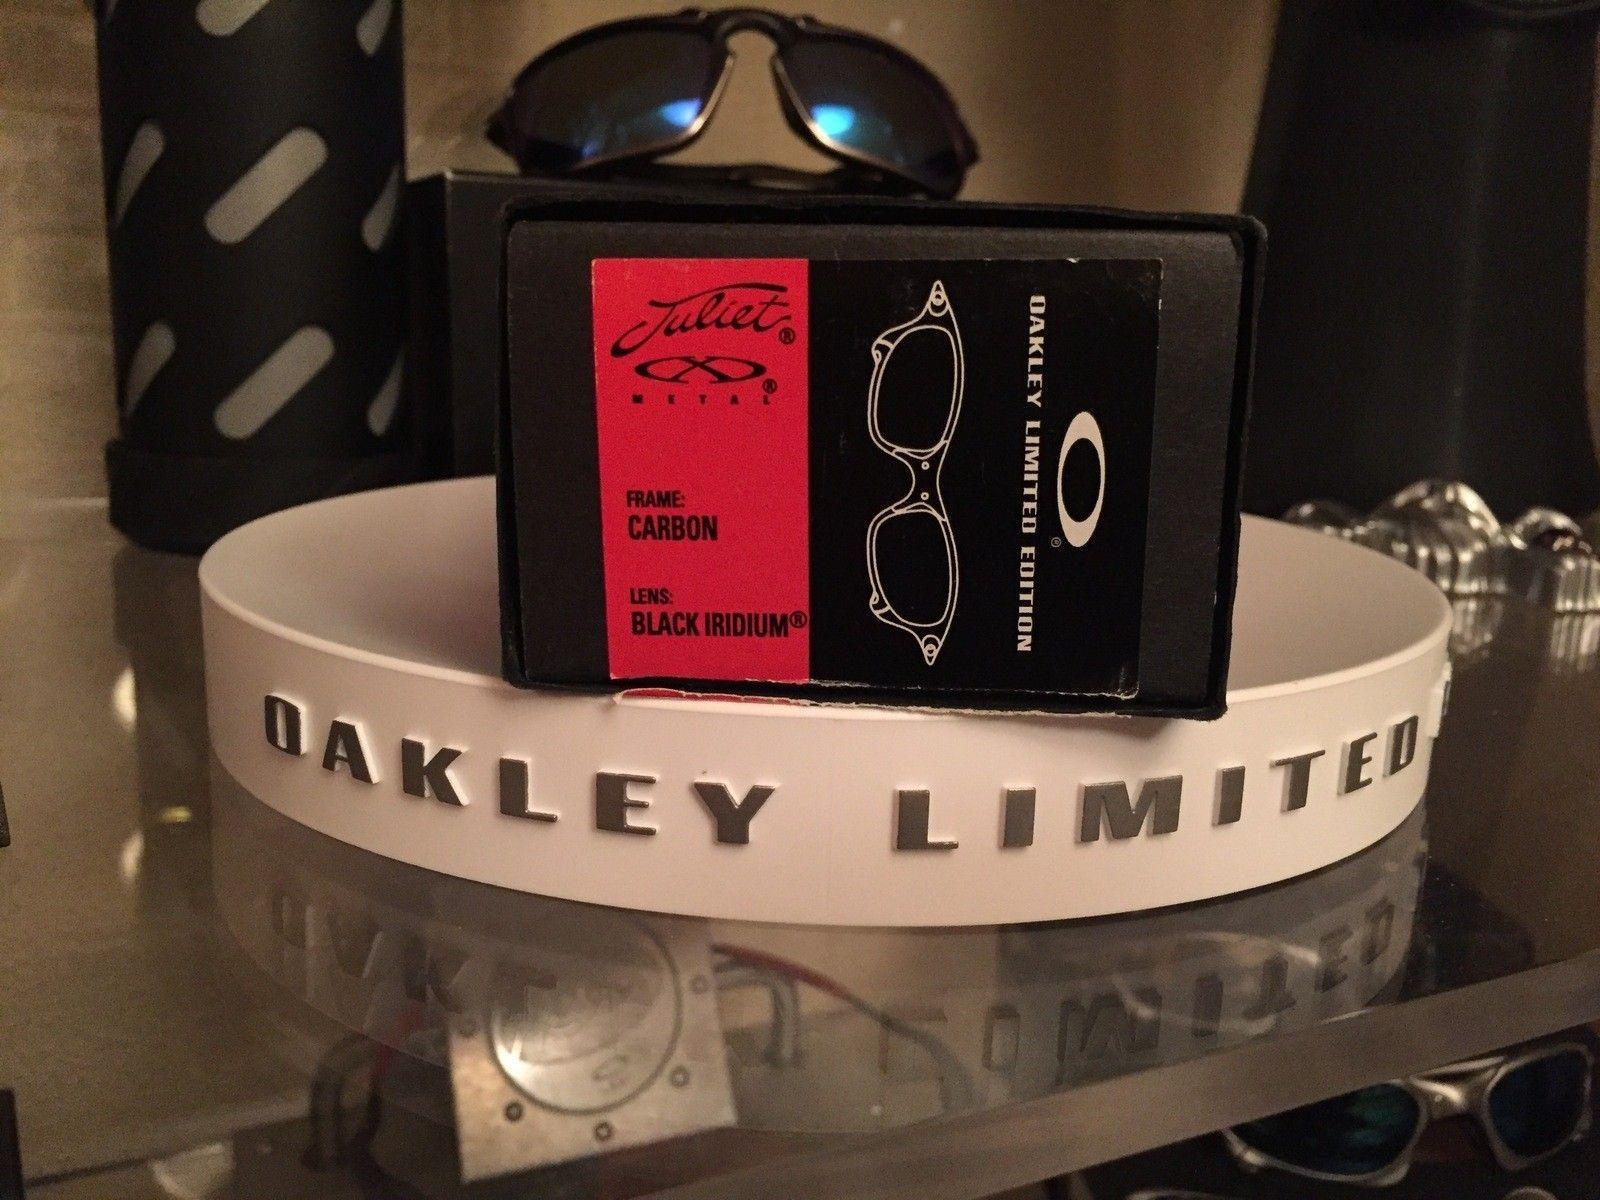 BNIB Juliet Ducati Carbon w/ Black Iridium Límited Edition #SOLD - image.jpeg